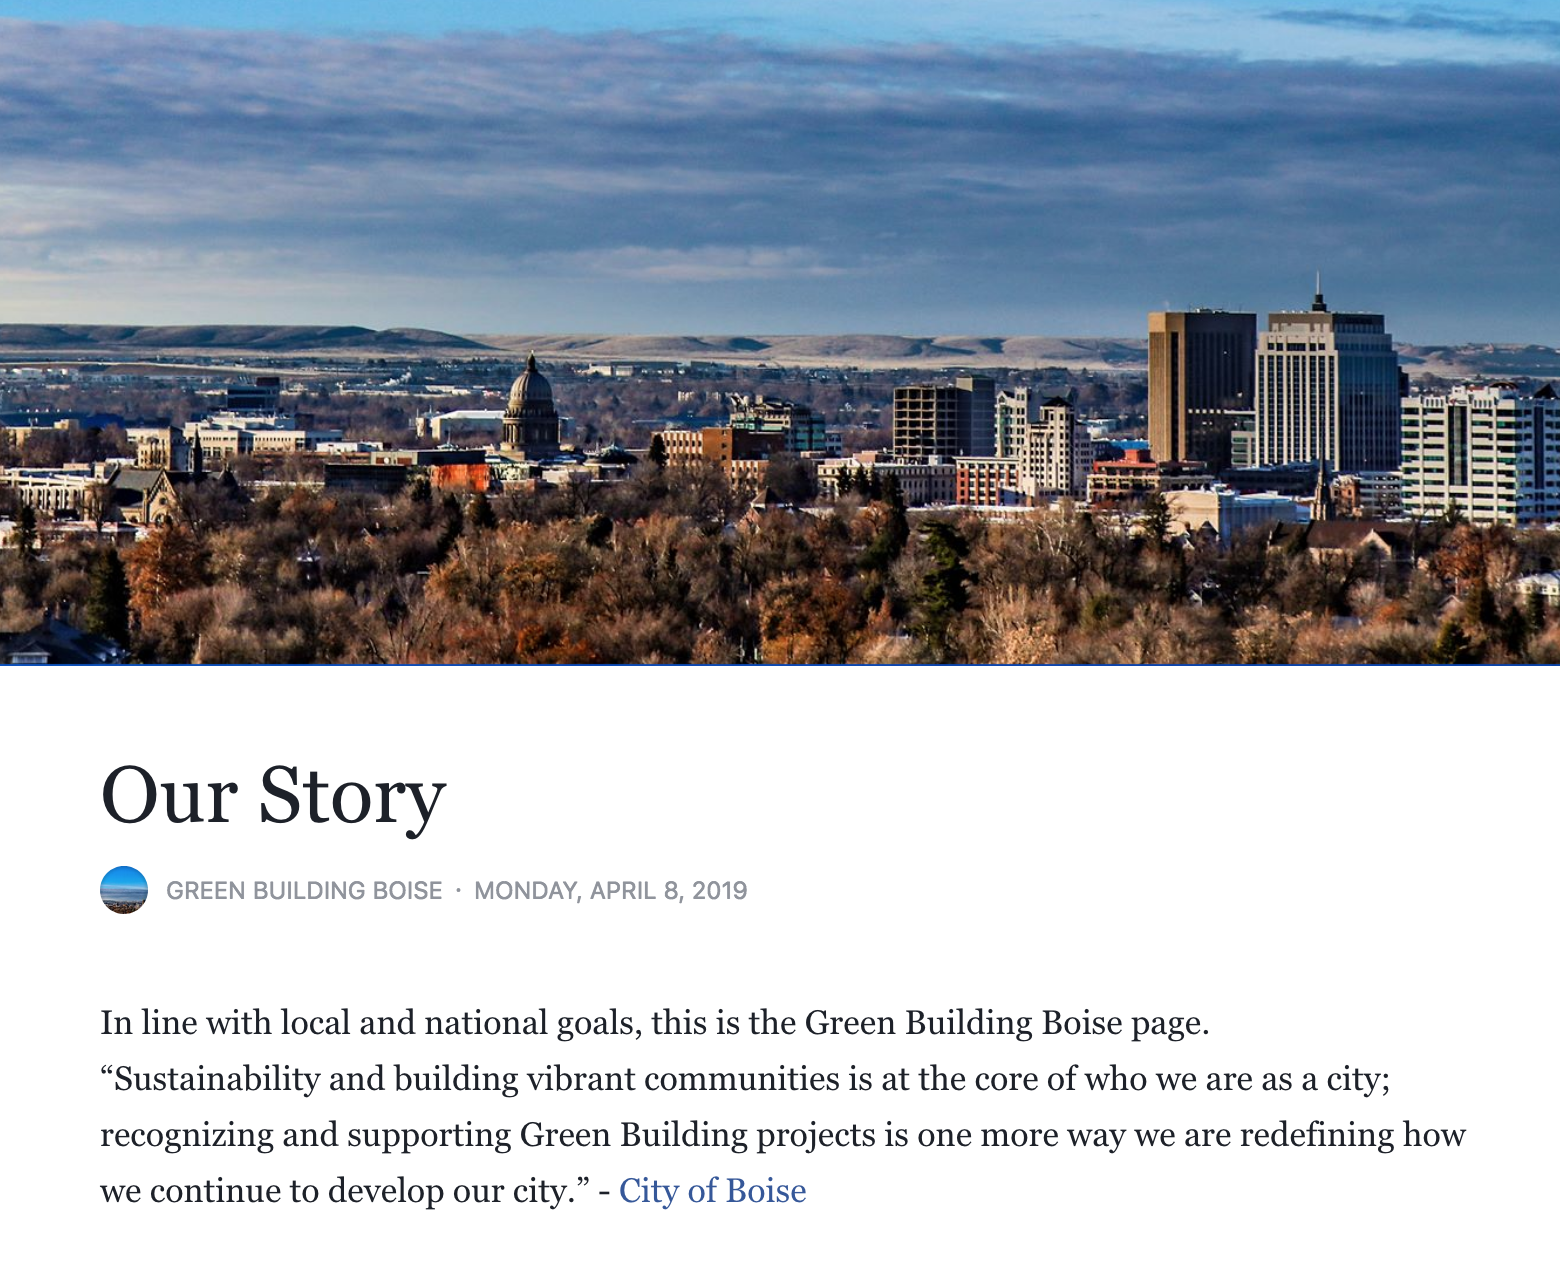 Green Building Boise